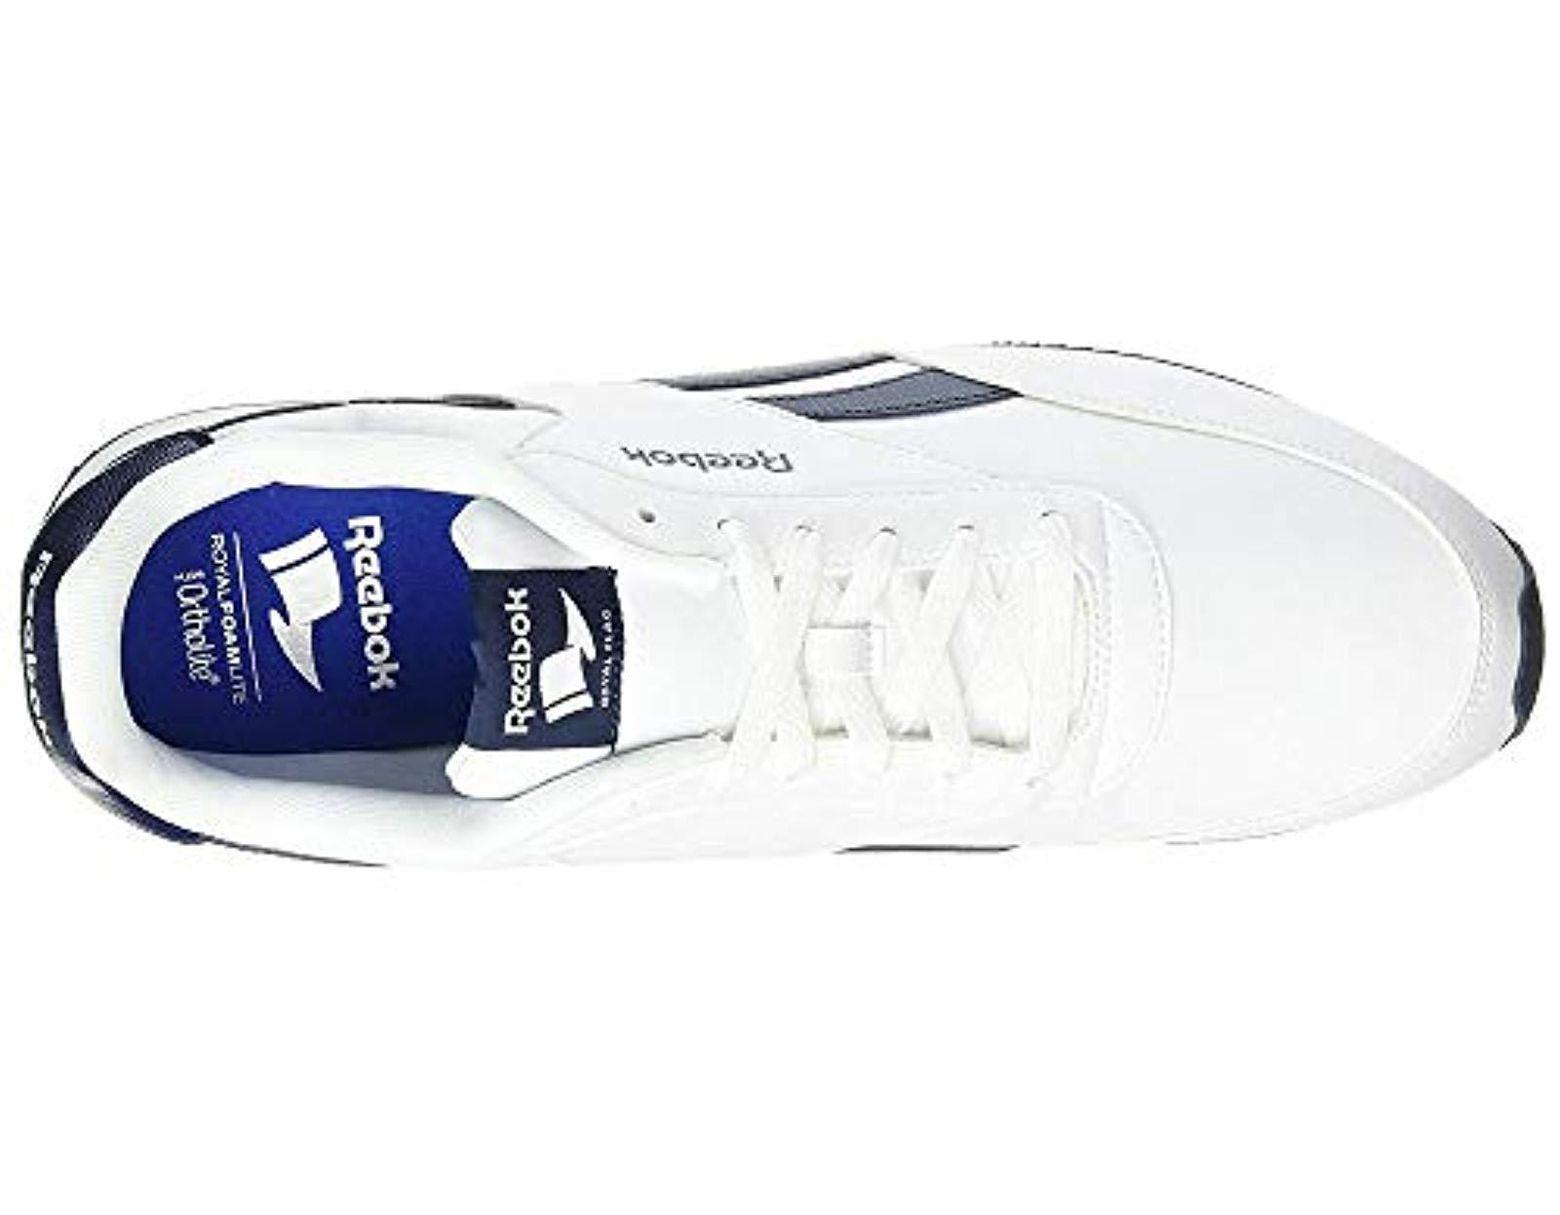 2707de6bab88b Reebok Royal Cl Jog 2l Gymnastics Shoes in White for Men - Save 32% - Lyst